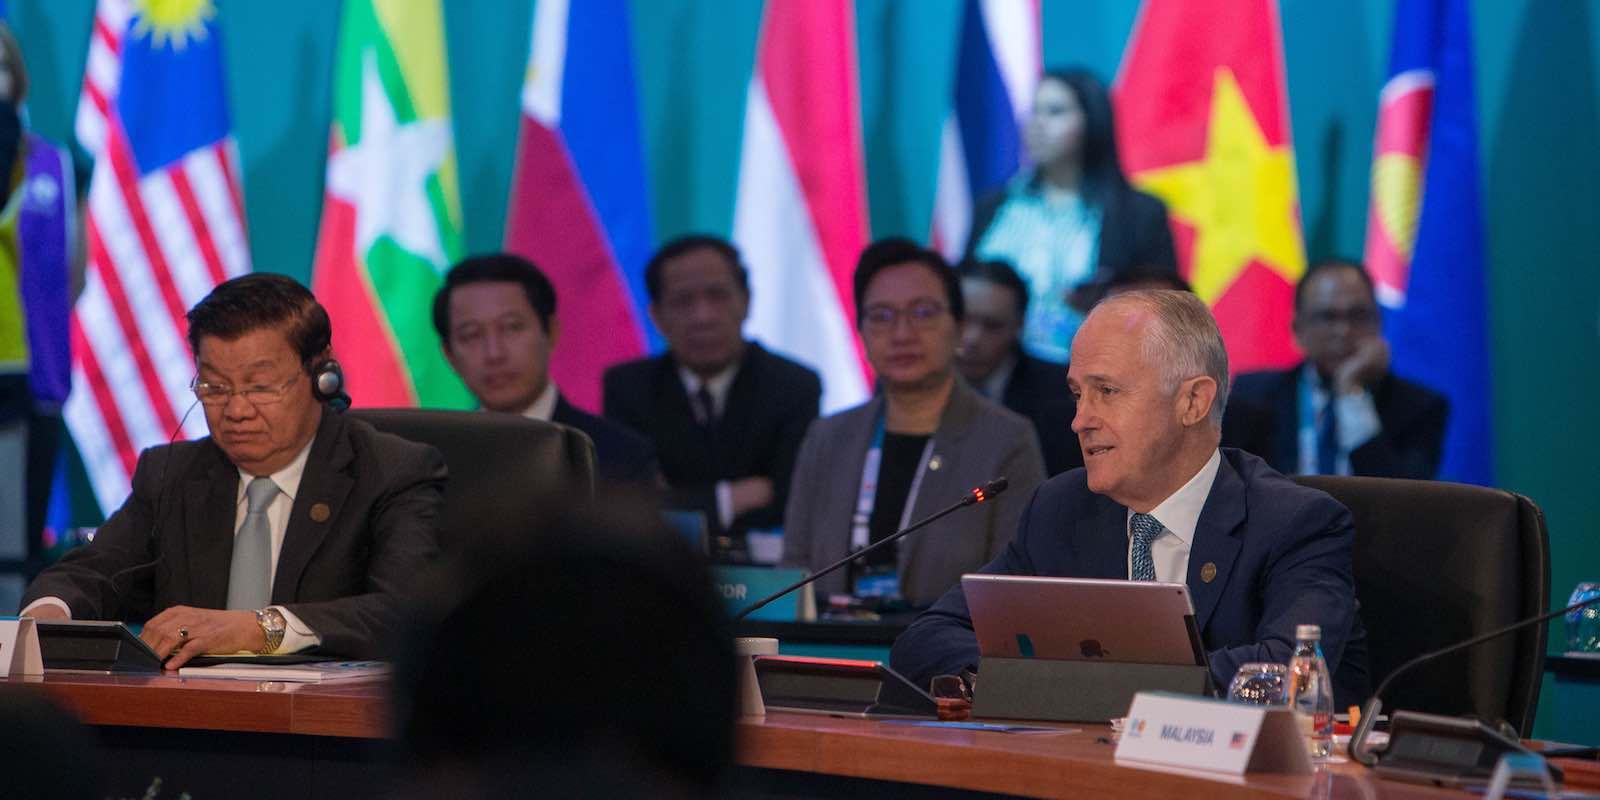 ASEAN-Australia Leaders Plenary in March (Photo: ASEAN-Australia Special Summit 2018/Flickr)